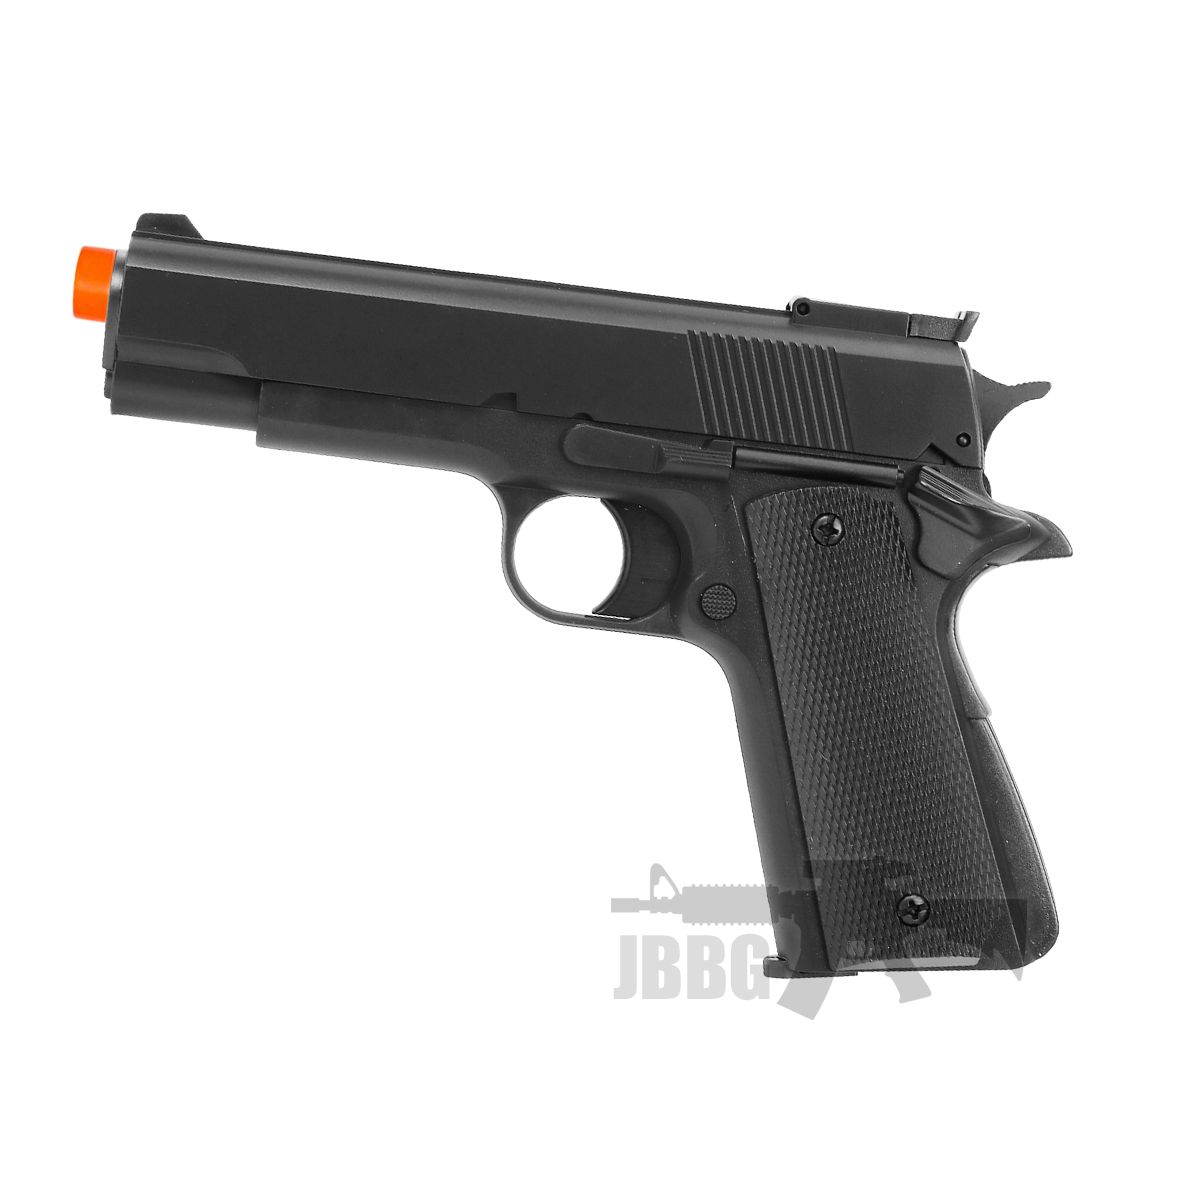 HG123 Airsoft Gas Pistol